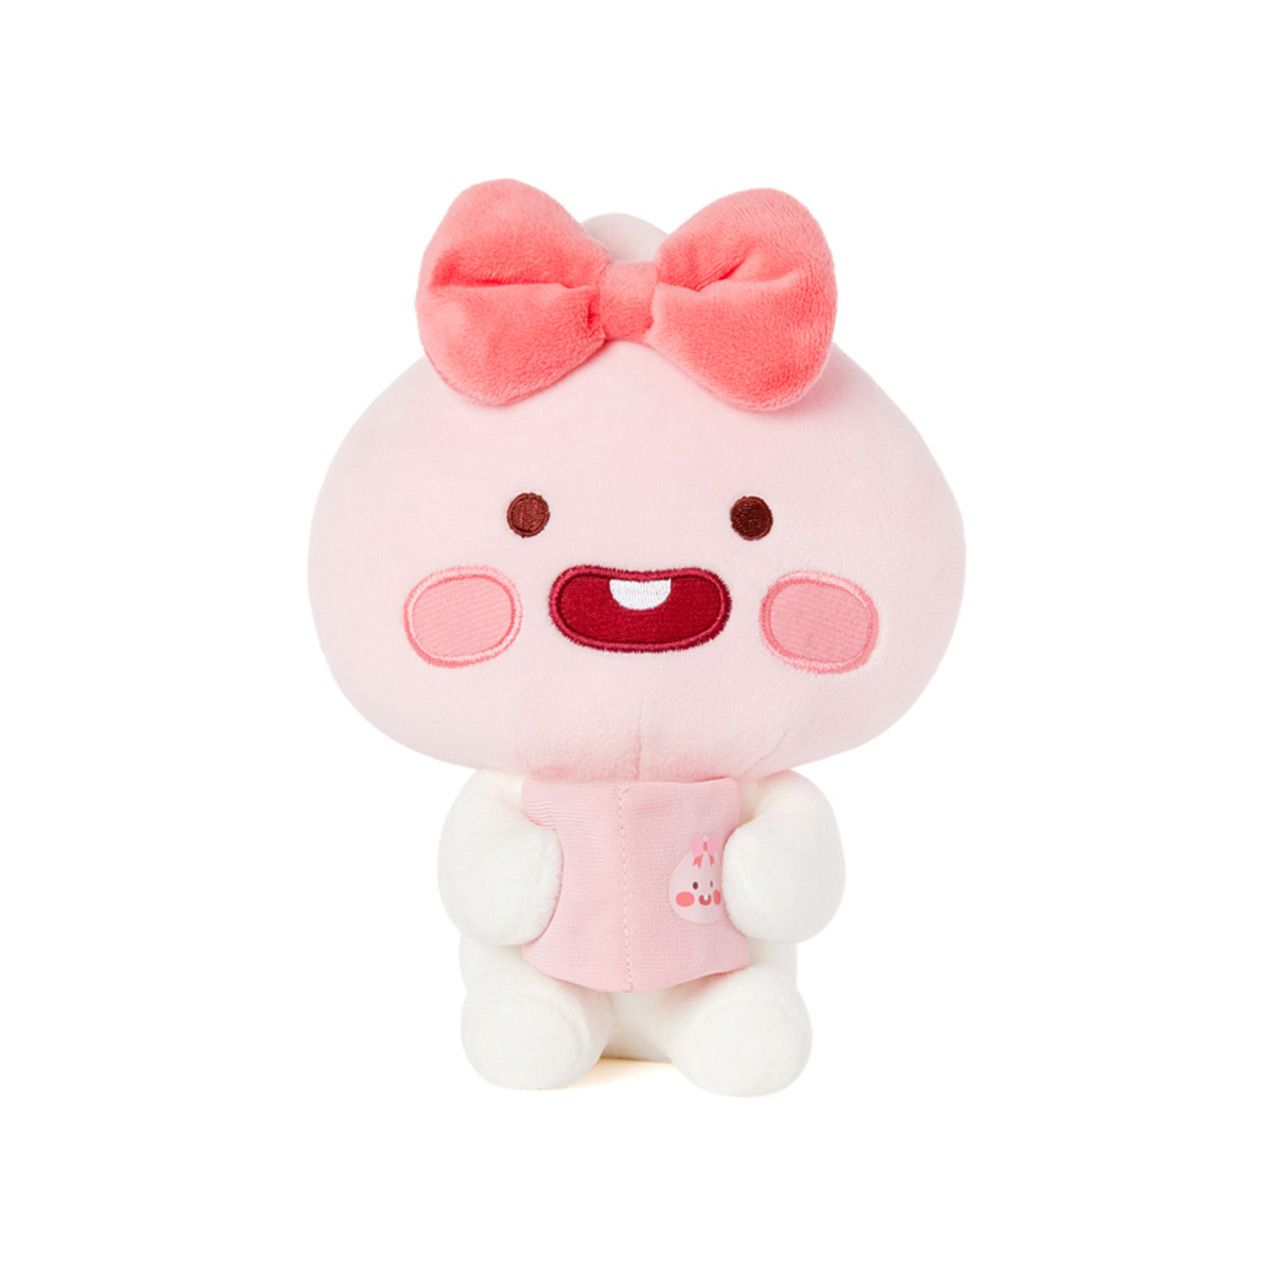 Newest super cute plush toy cushion Line Friend bear rabbit birthday gift 1pc